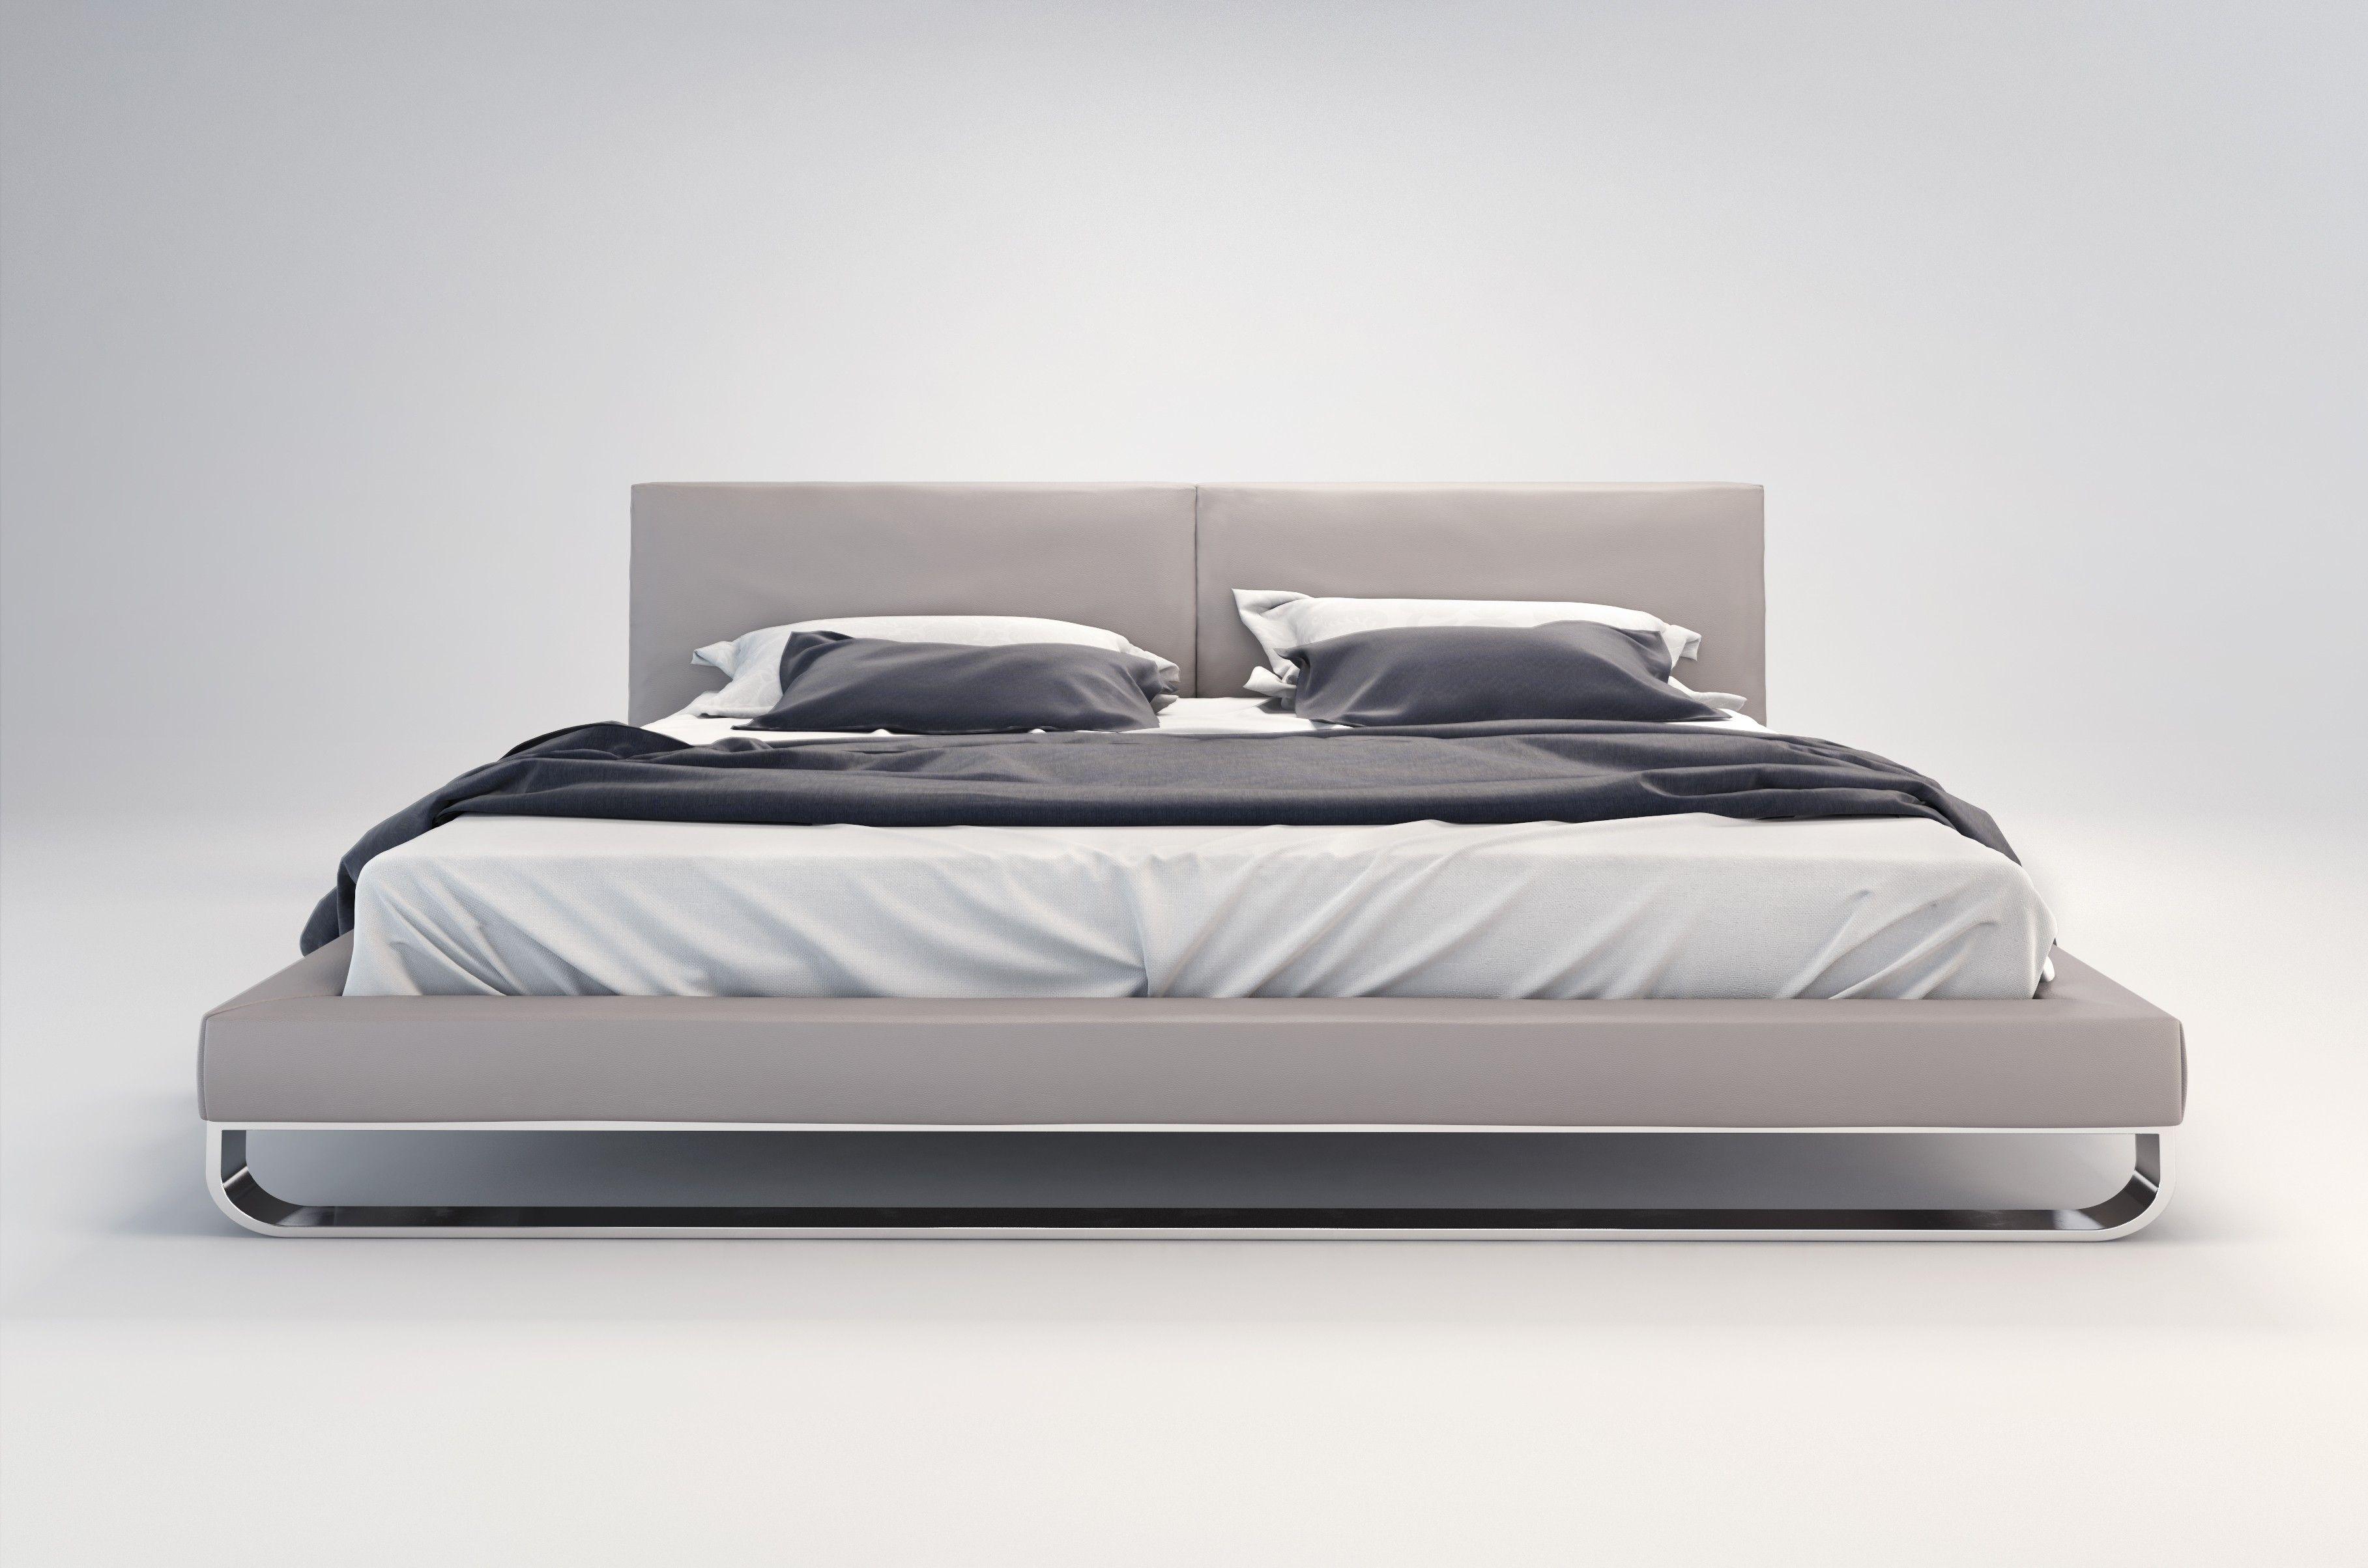 Low Profile Bed Frames King Modern Bed Contemporary Platform